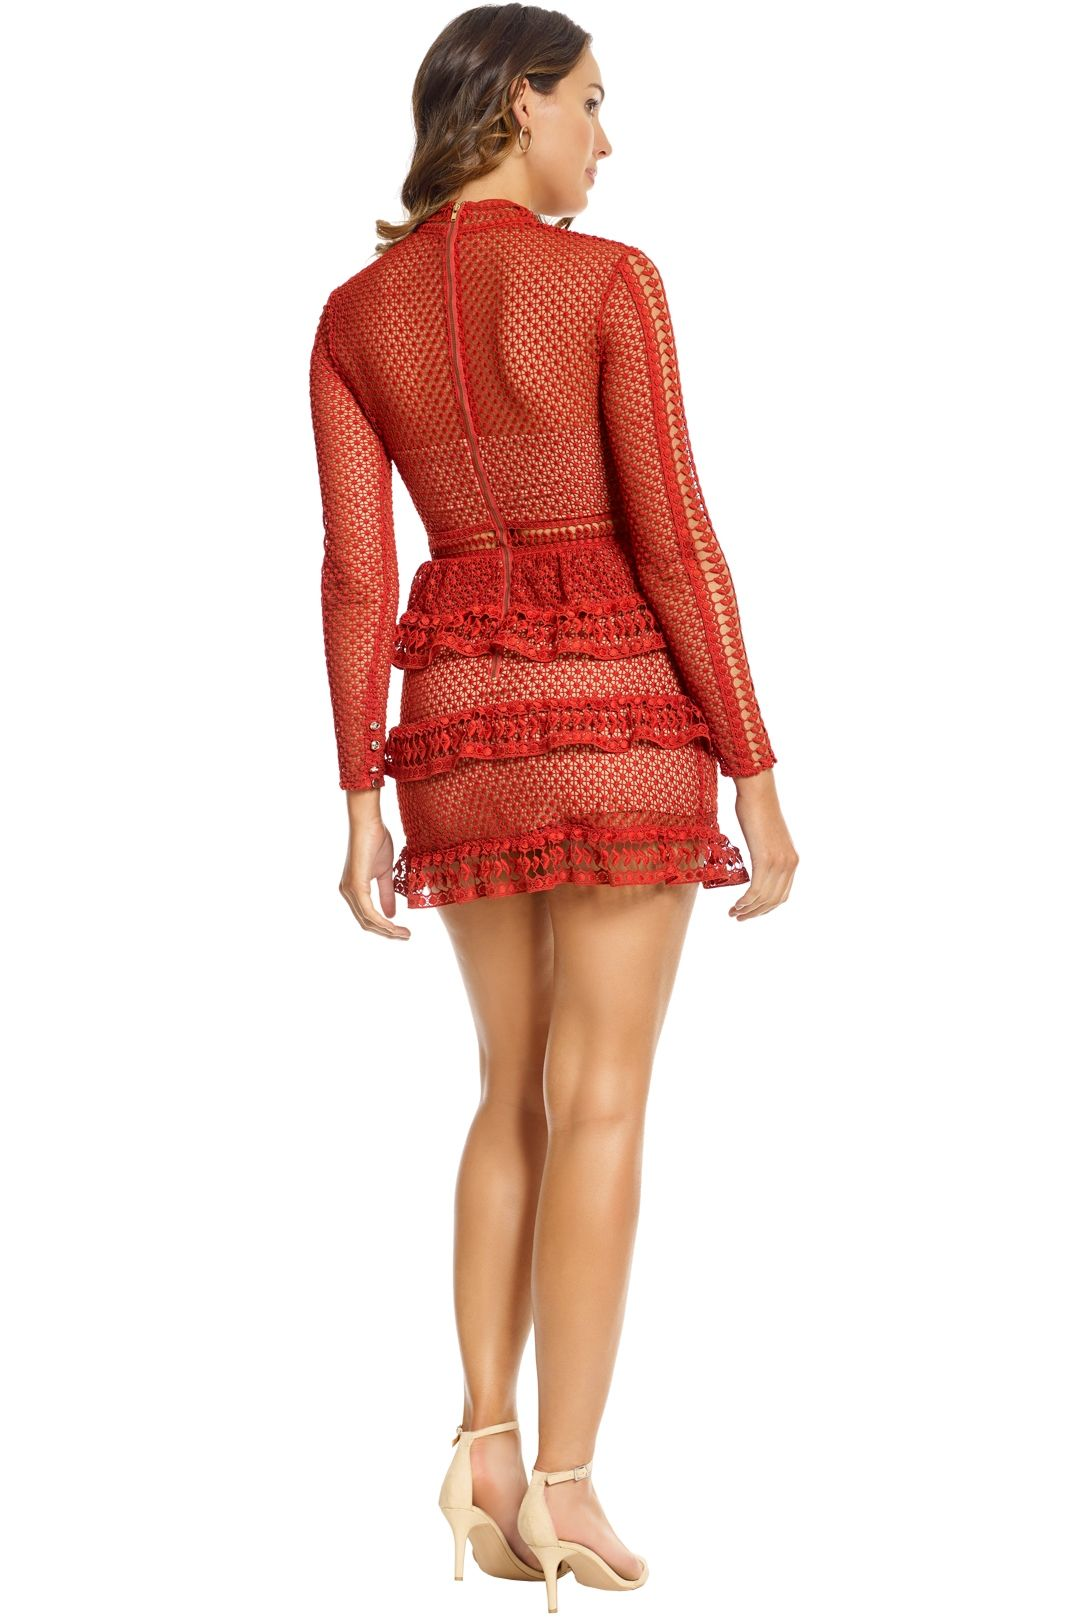 Self Portrait - Tiered Guipure Lace Mini Dress - Crimson Red - Back